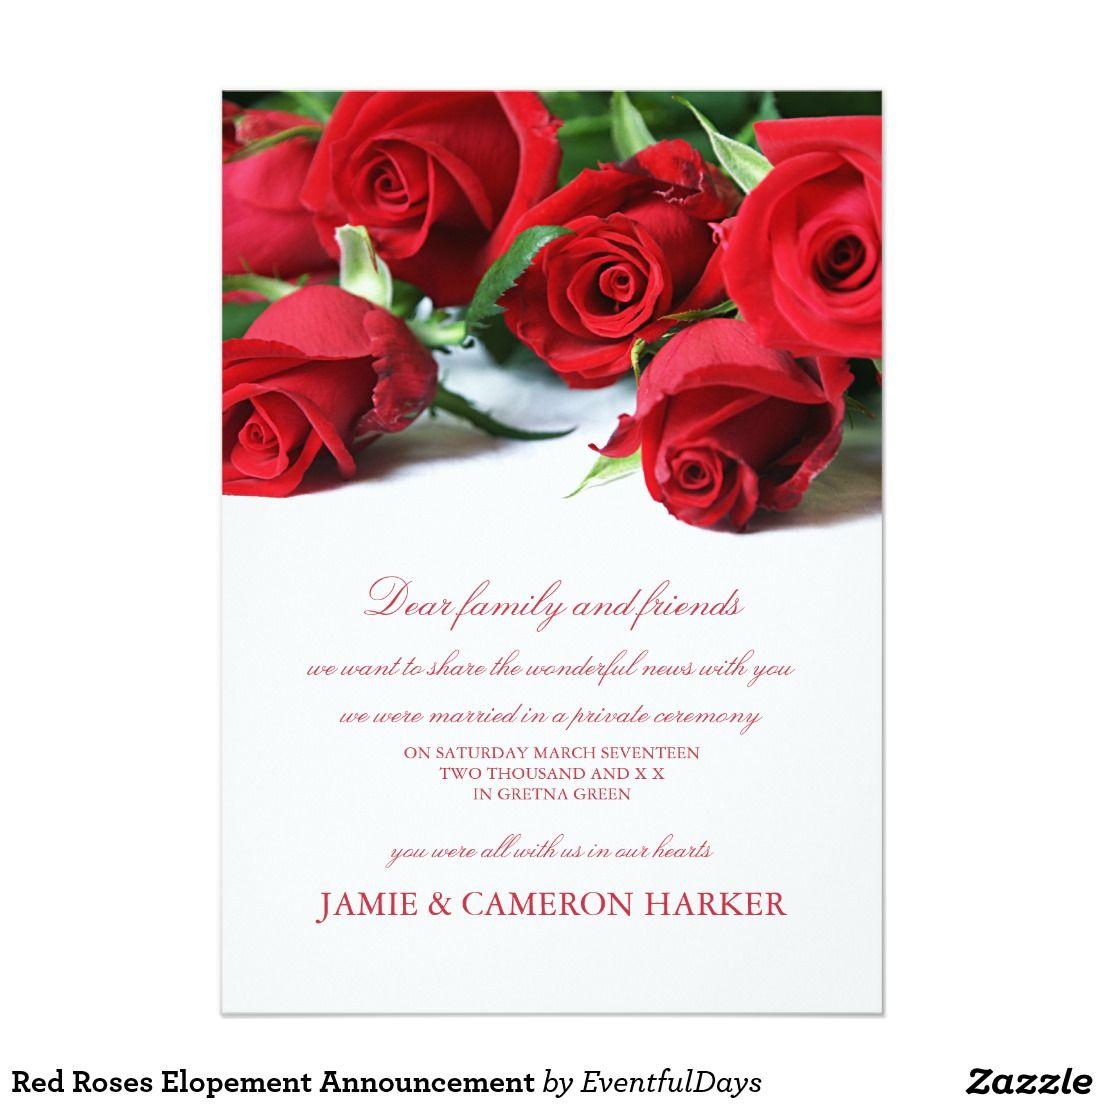 Red Roses Elopement Announcement | svatba - různé | Pinterest ...